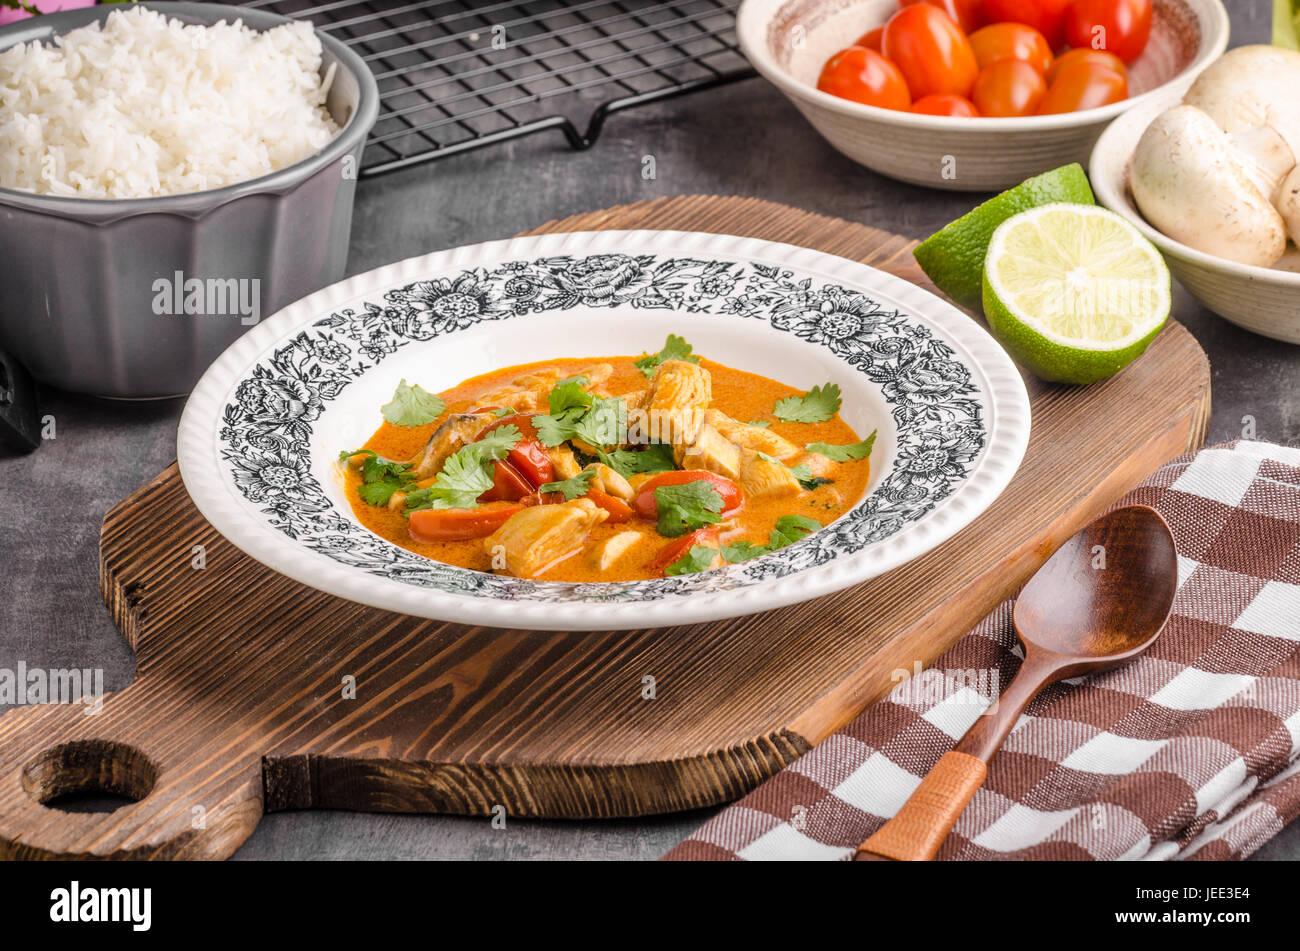 Food photography - Stock Image